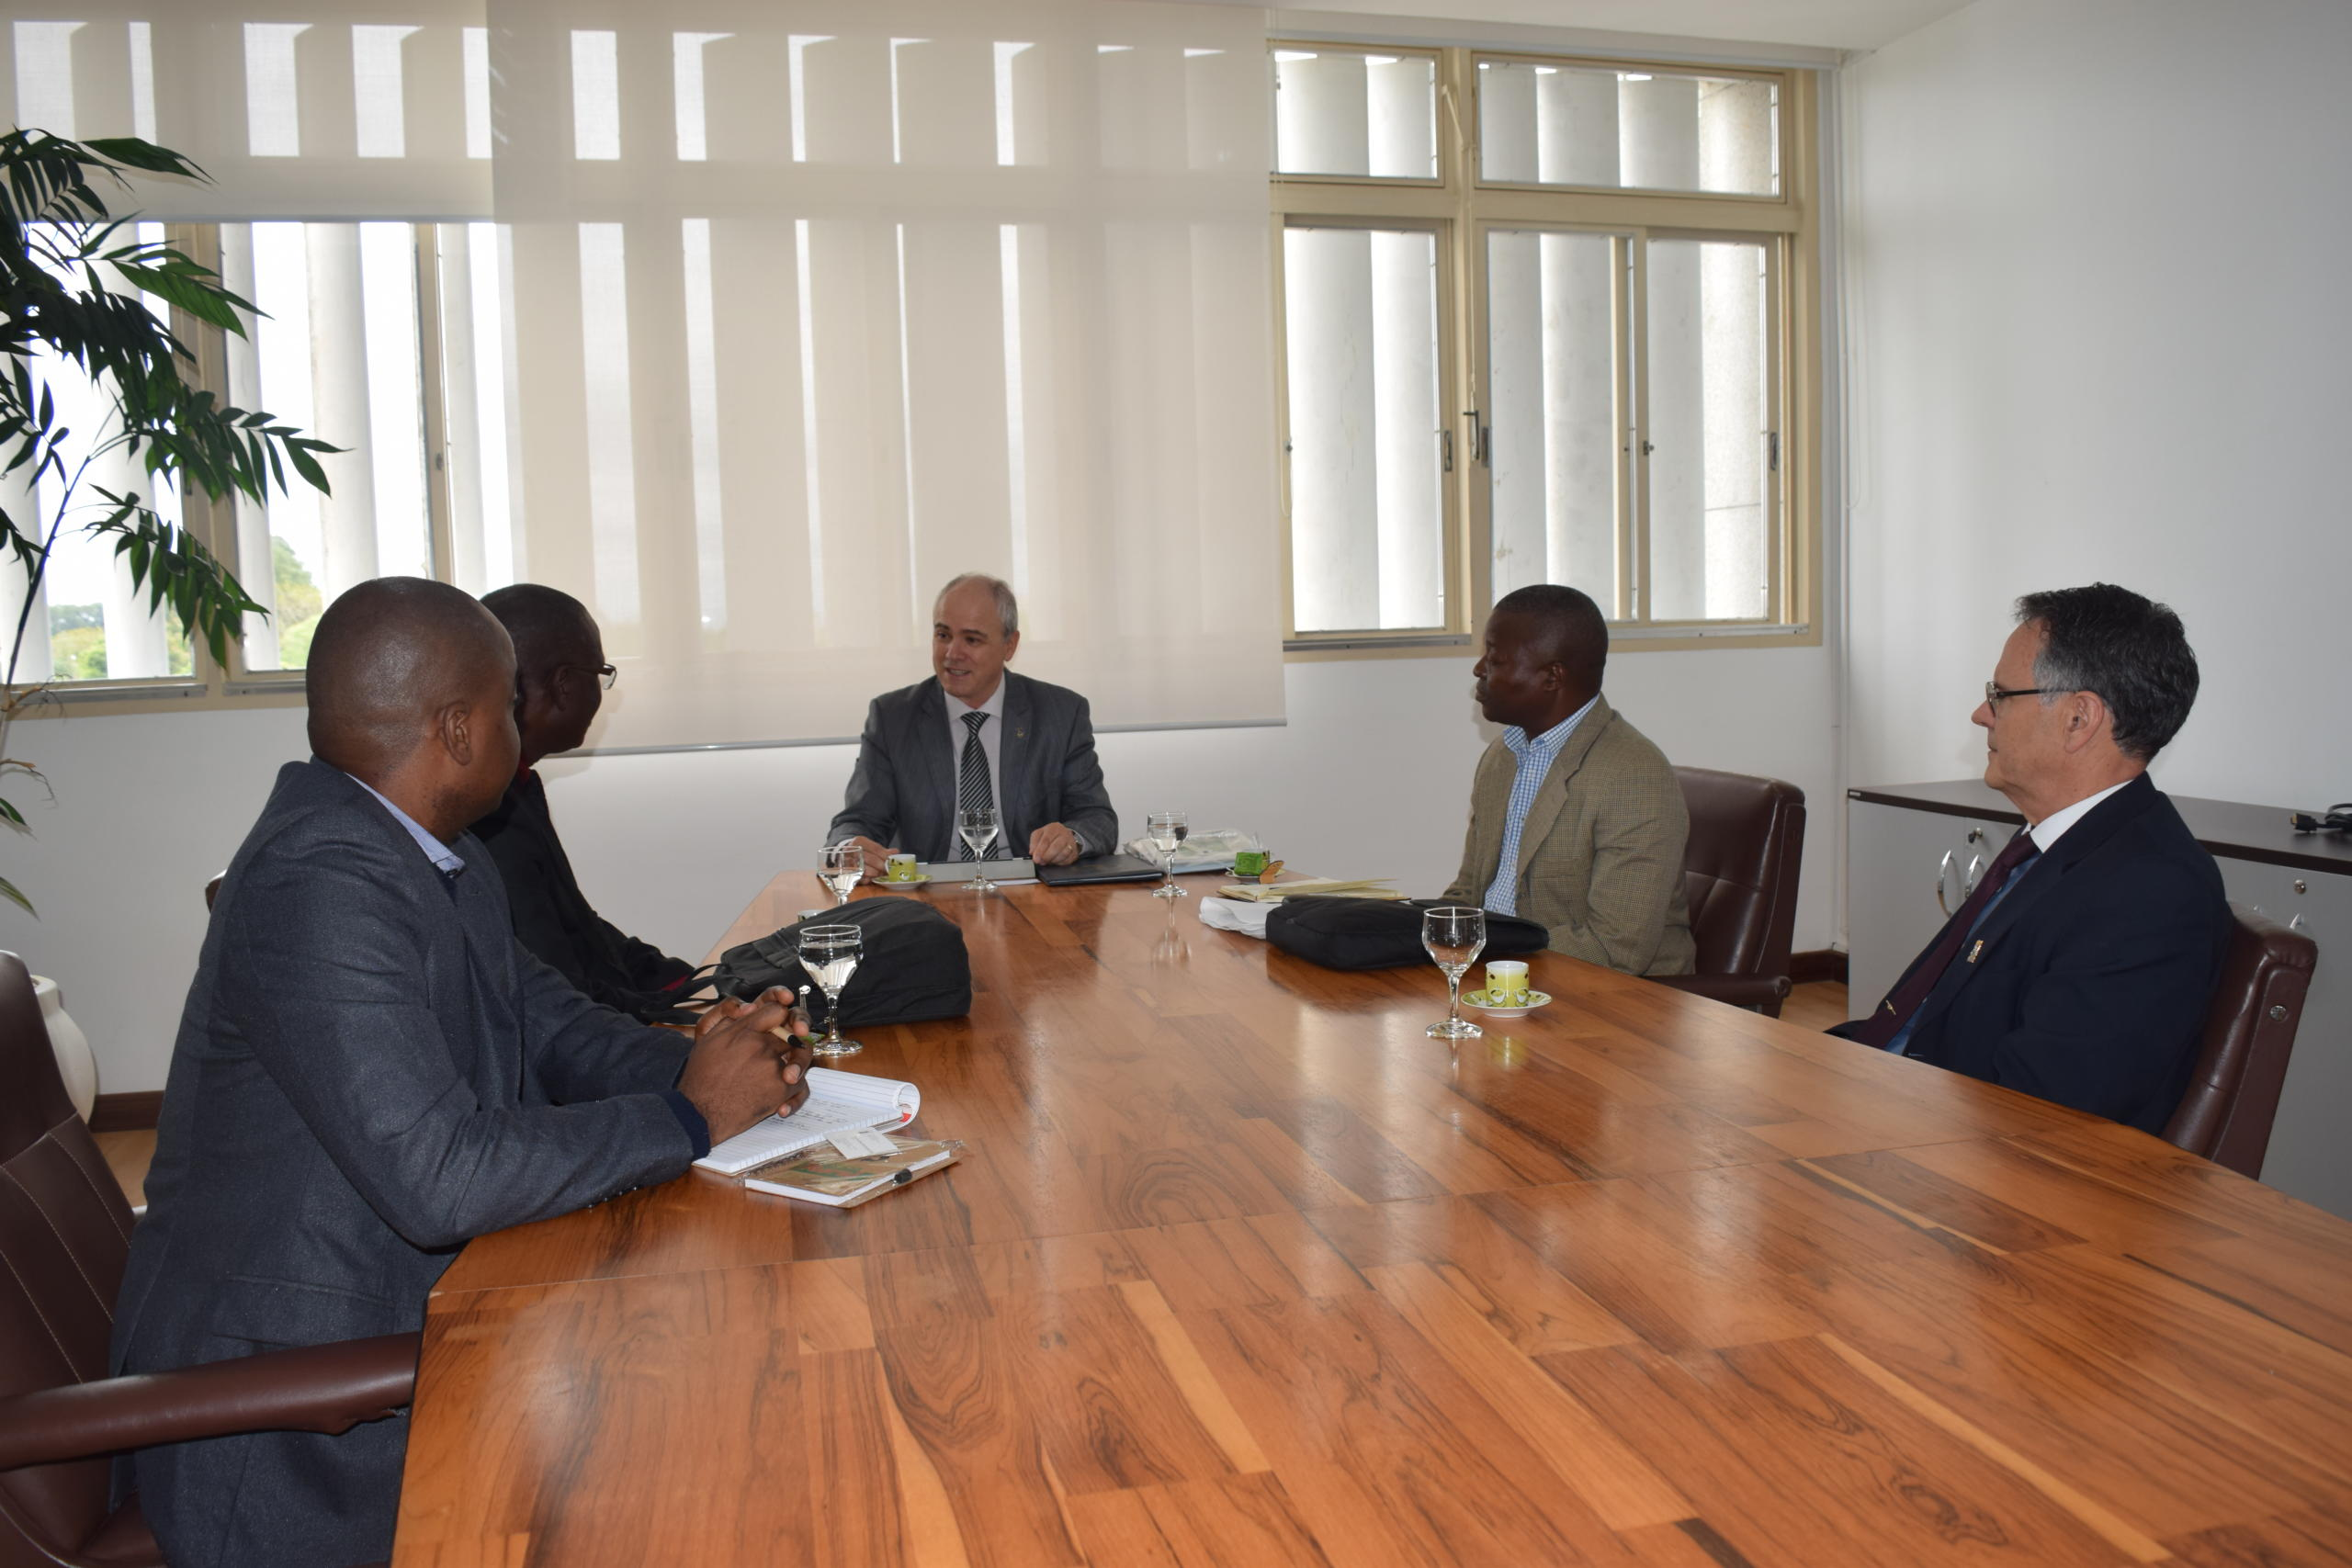 12 09 2017 Assinatura acordo Unizambeze Mirian Quadros 5